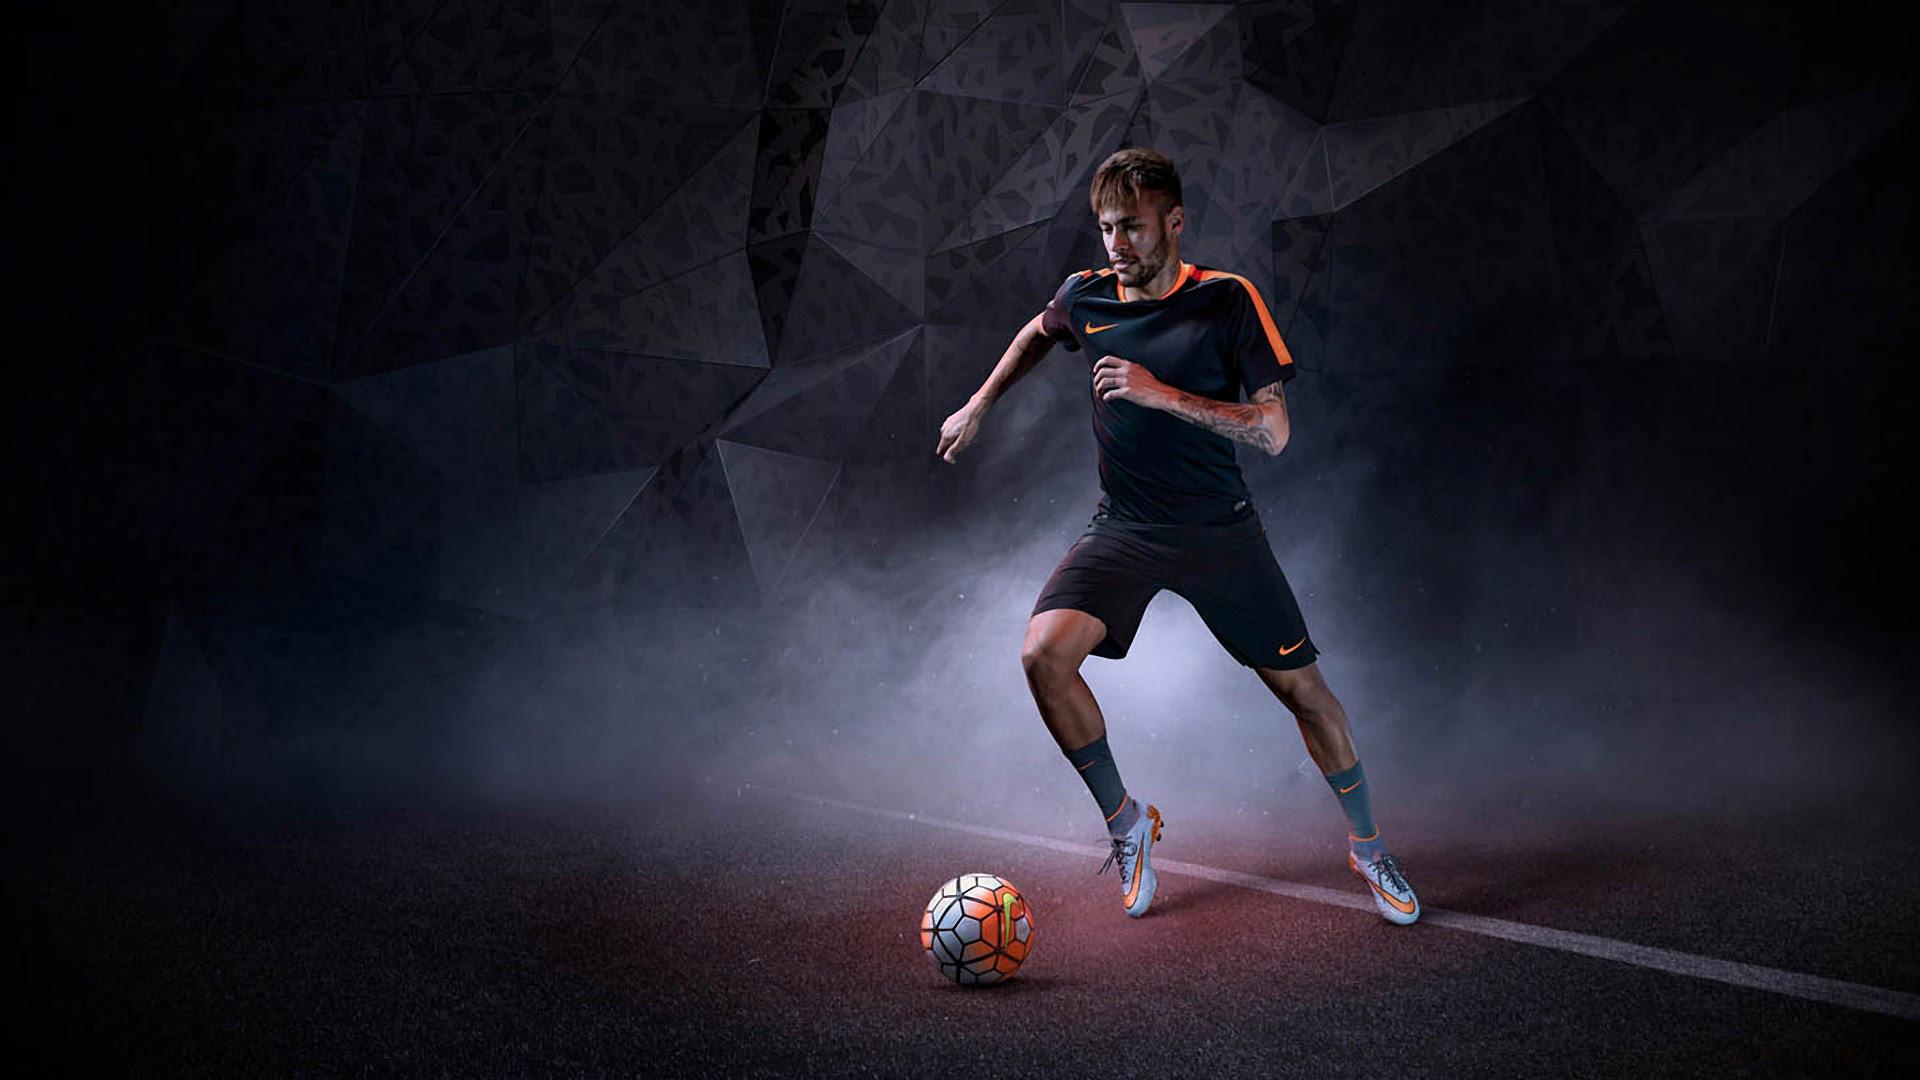 Neymar Jr Nike Wallpaper